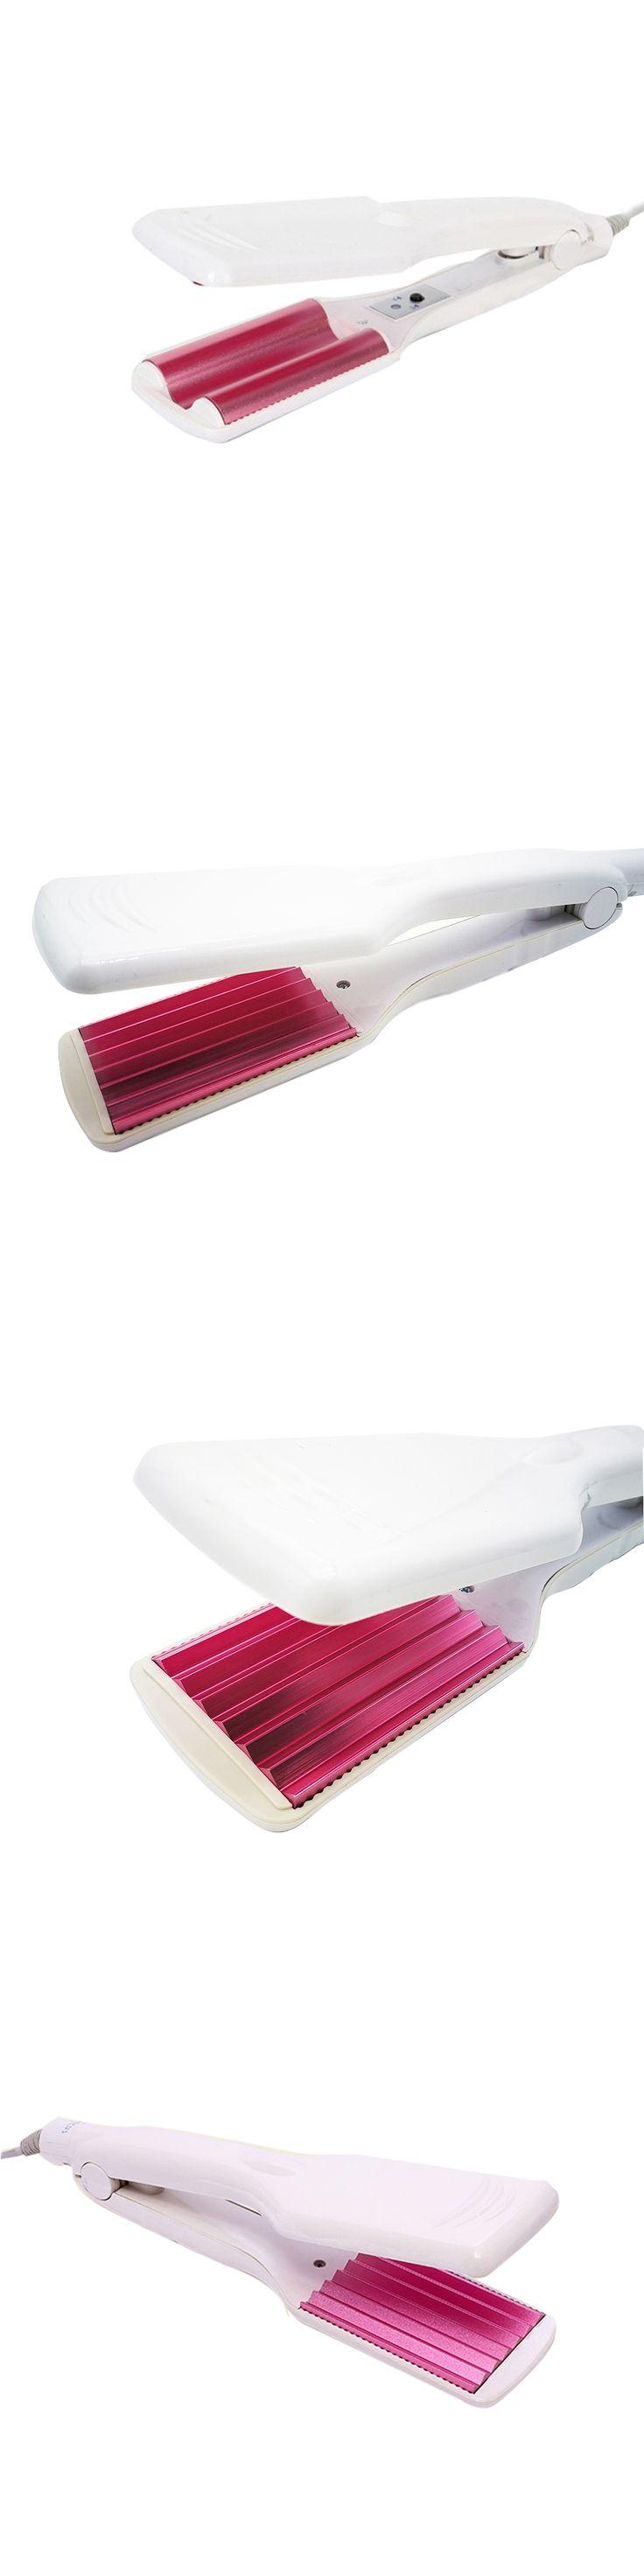 110-240V Small corn rolls Hair Curling Iron Corrugated rolls Hair Curler Curling Iron Hair Styling Tools EU plug